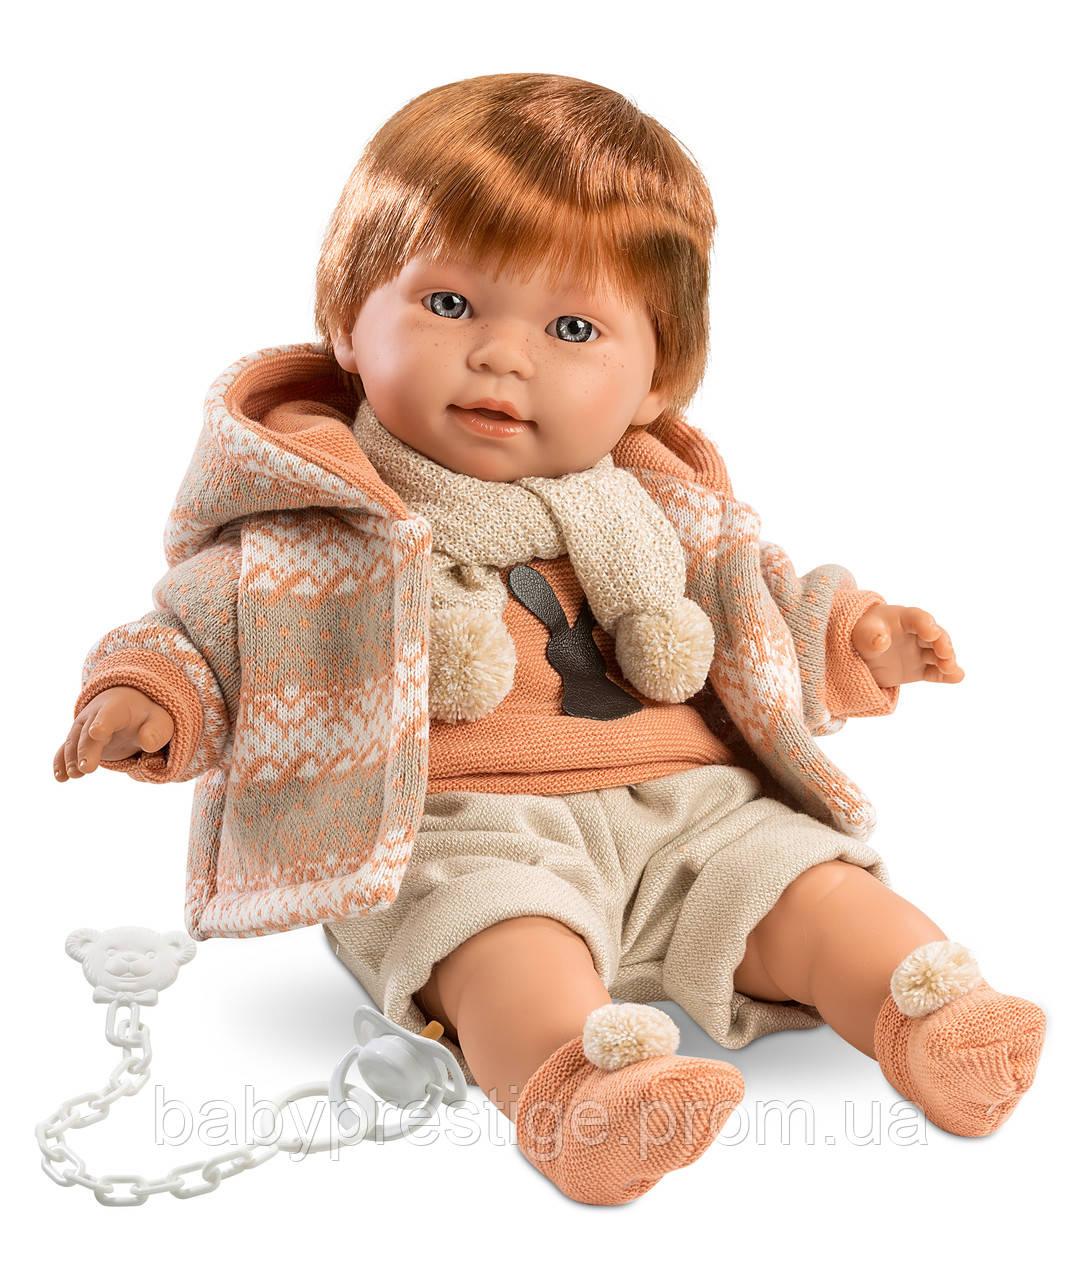 Кукла Llorens - Kristian, 42 см